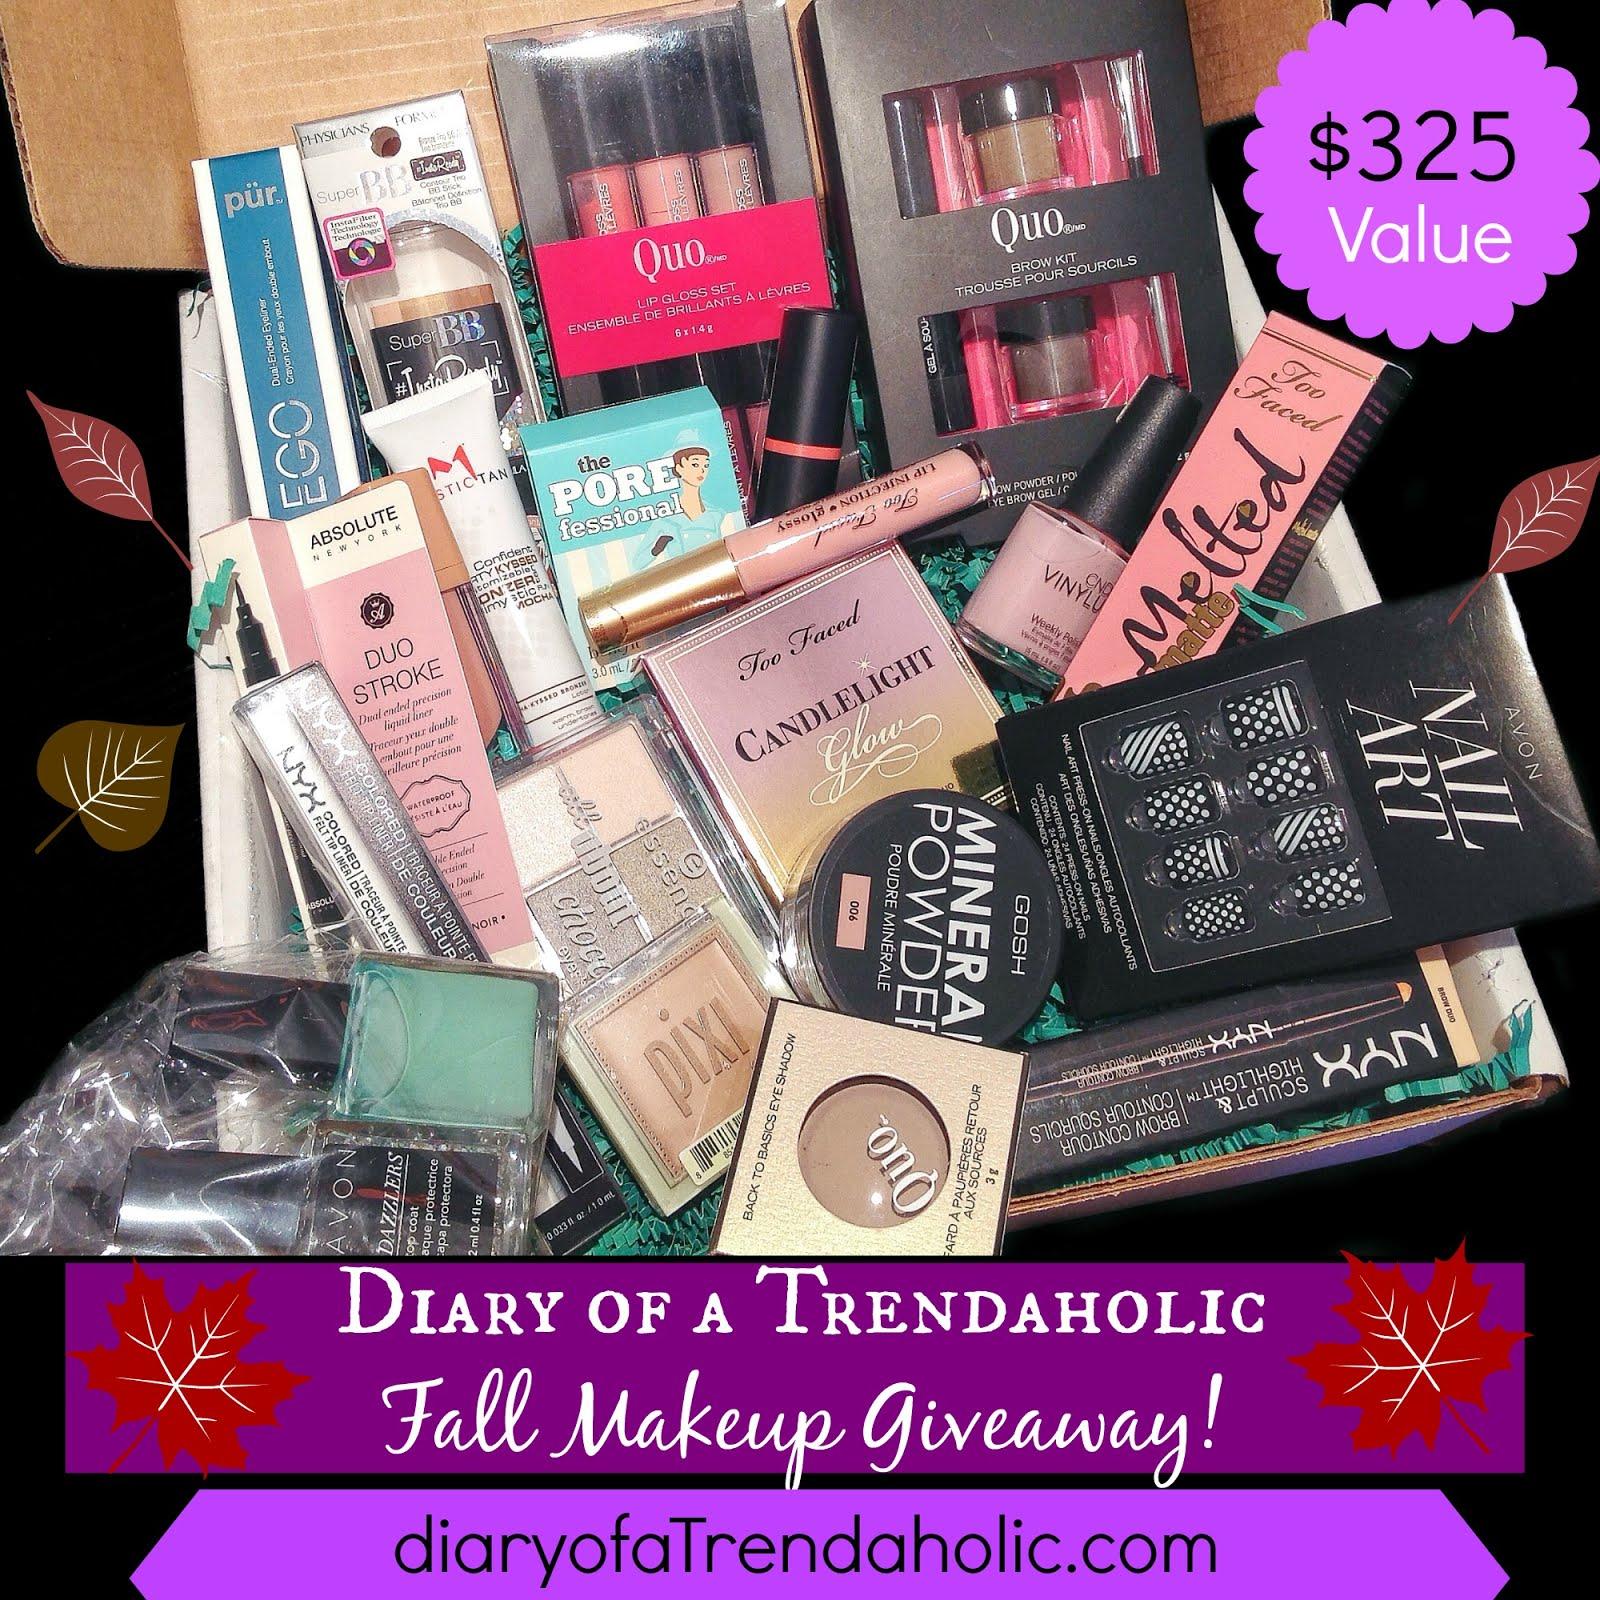 $325 Makeup Giveaway!